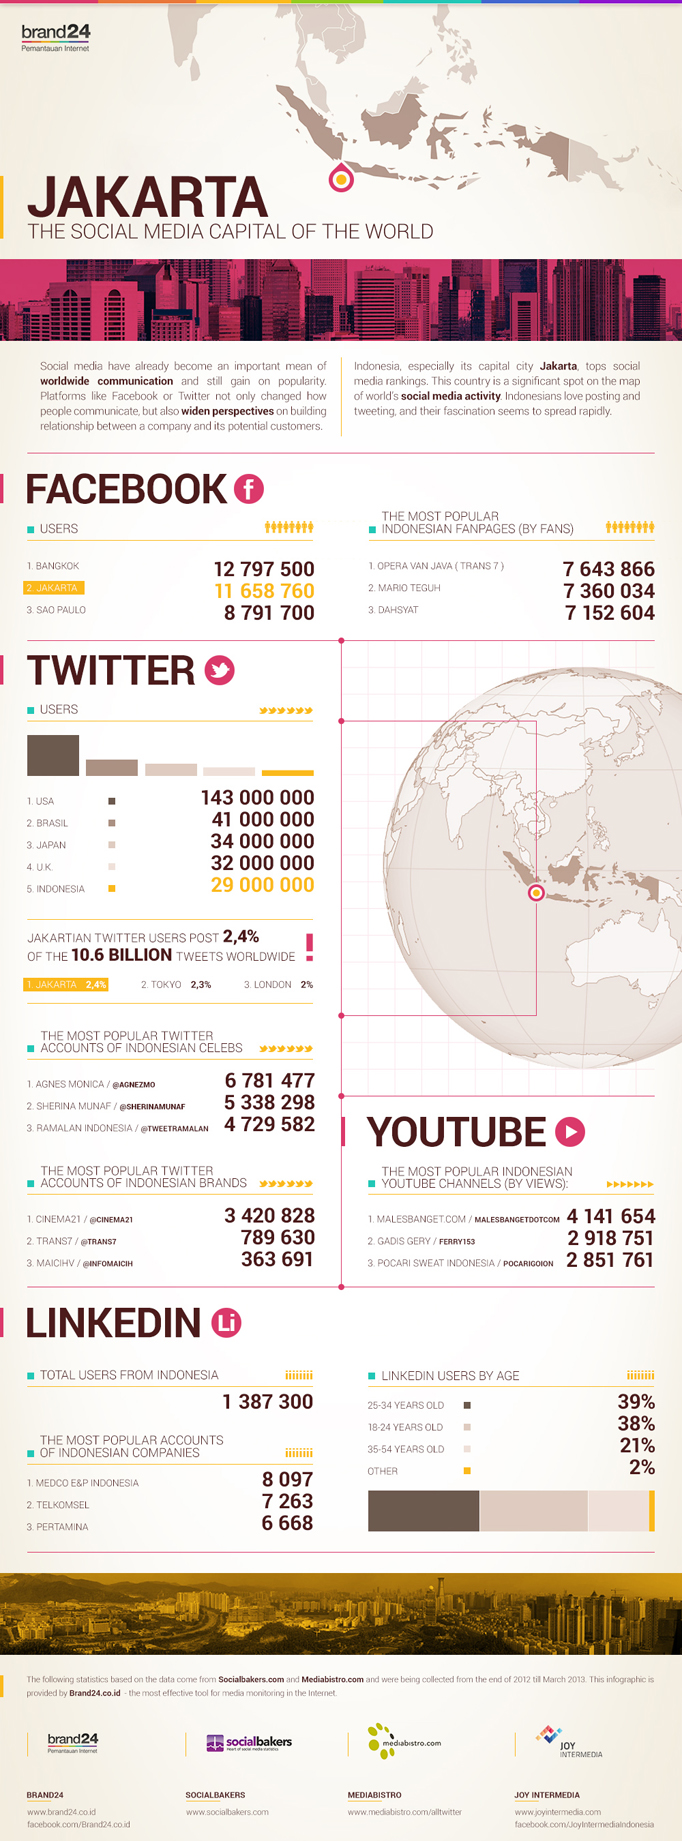 Jakarta is Twitter capital of the world